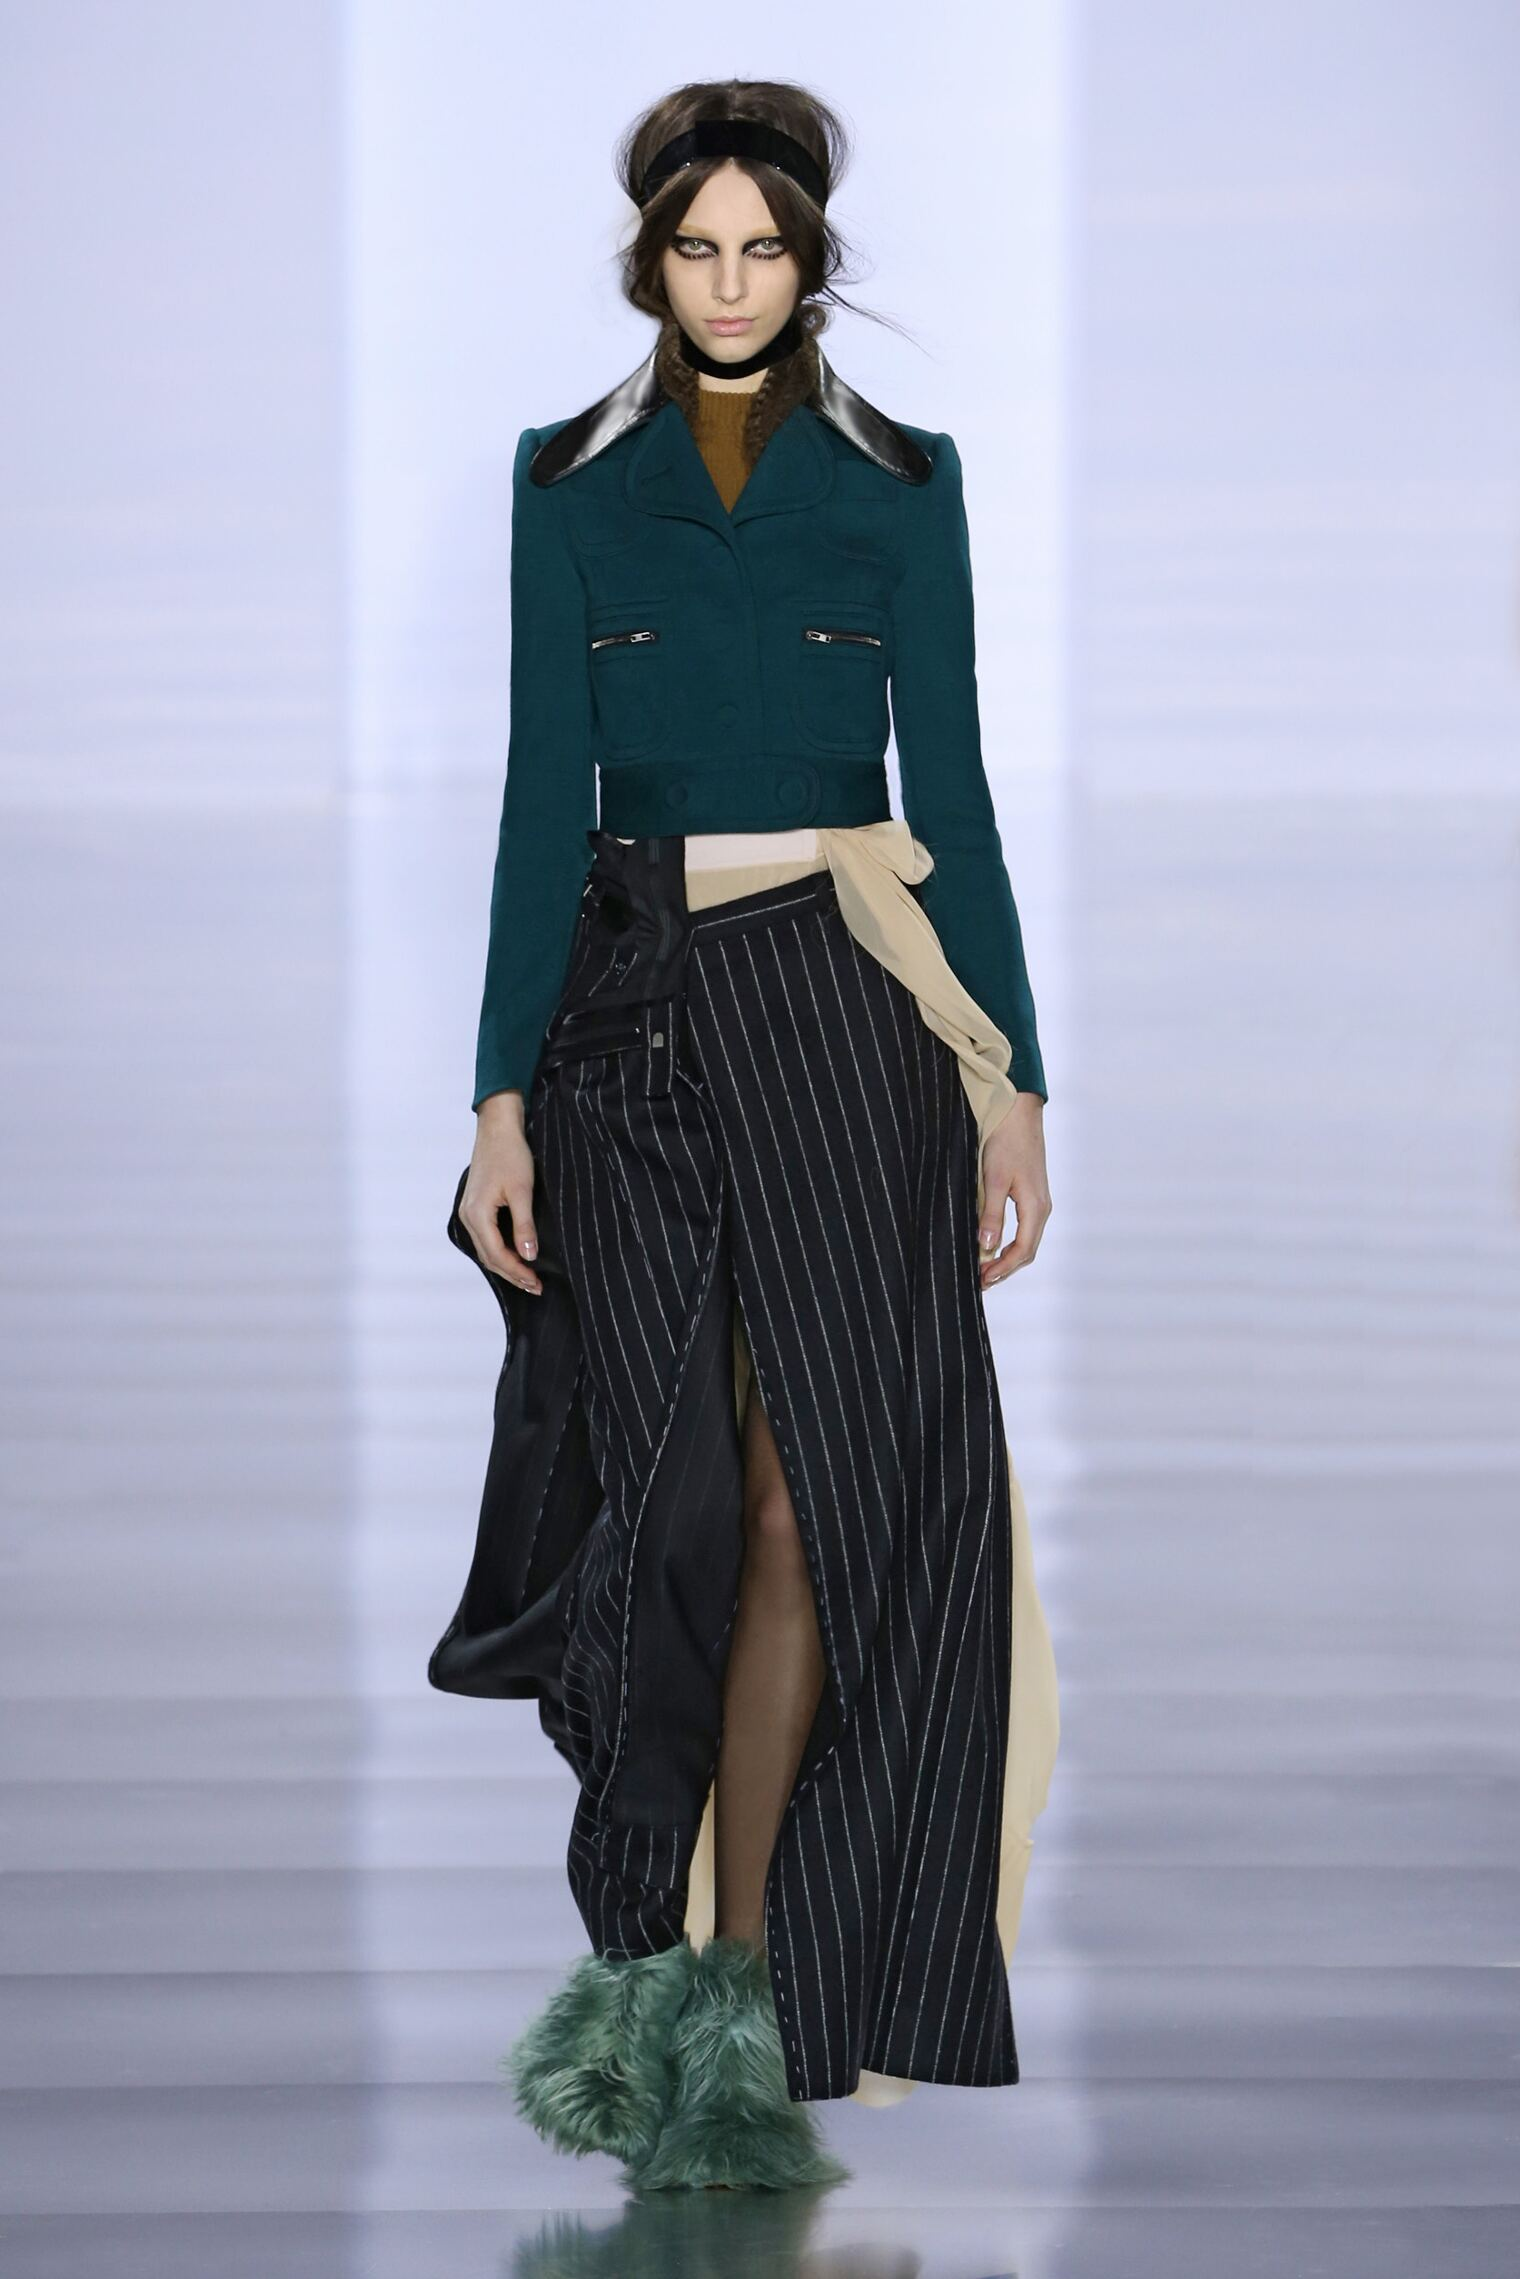 Winter 2015 Fashion Show Maison Margiela Collection